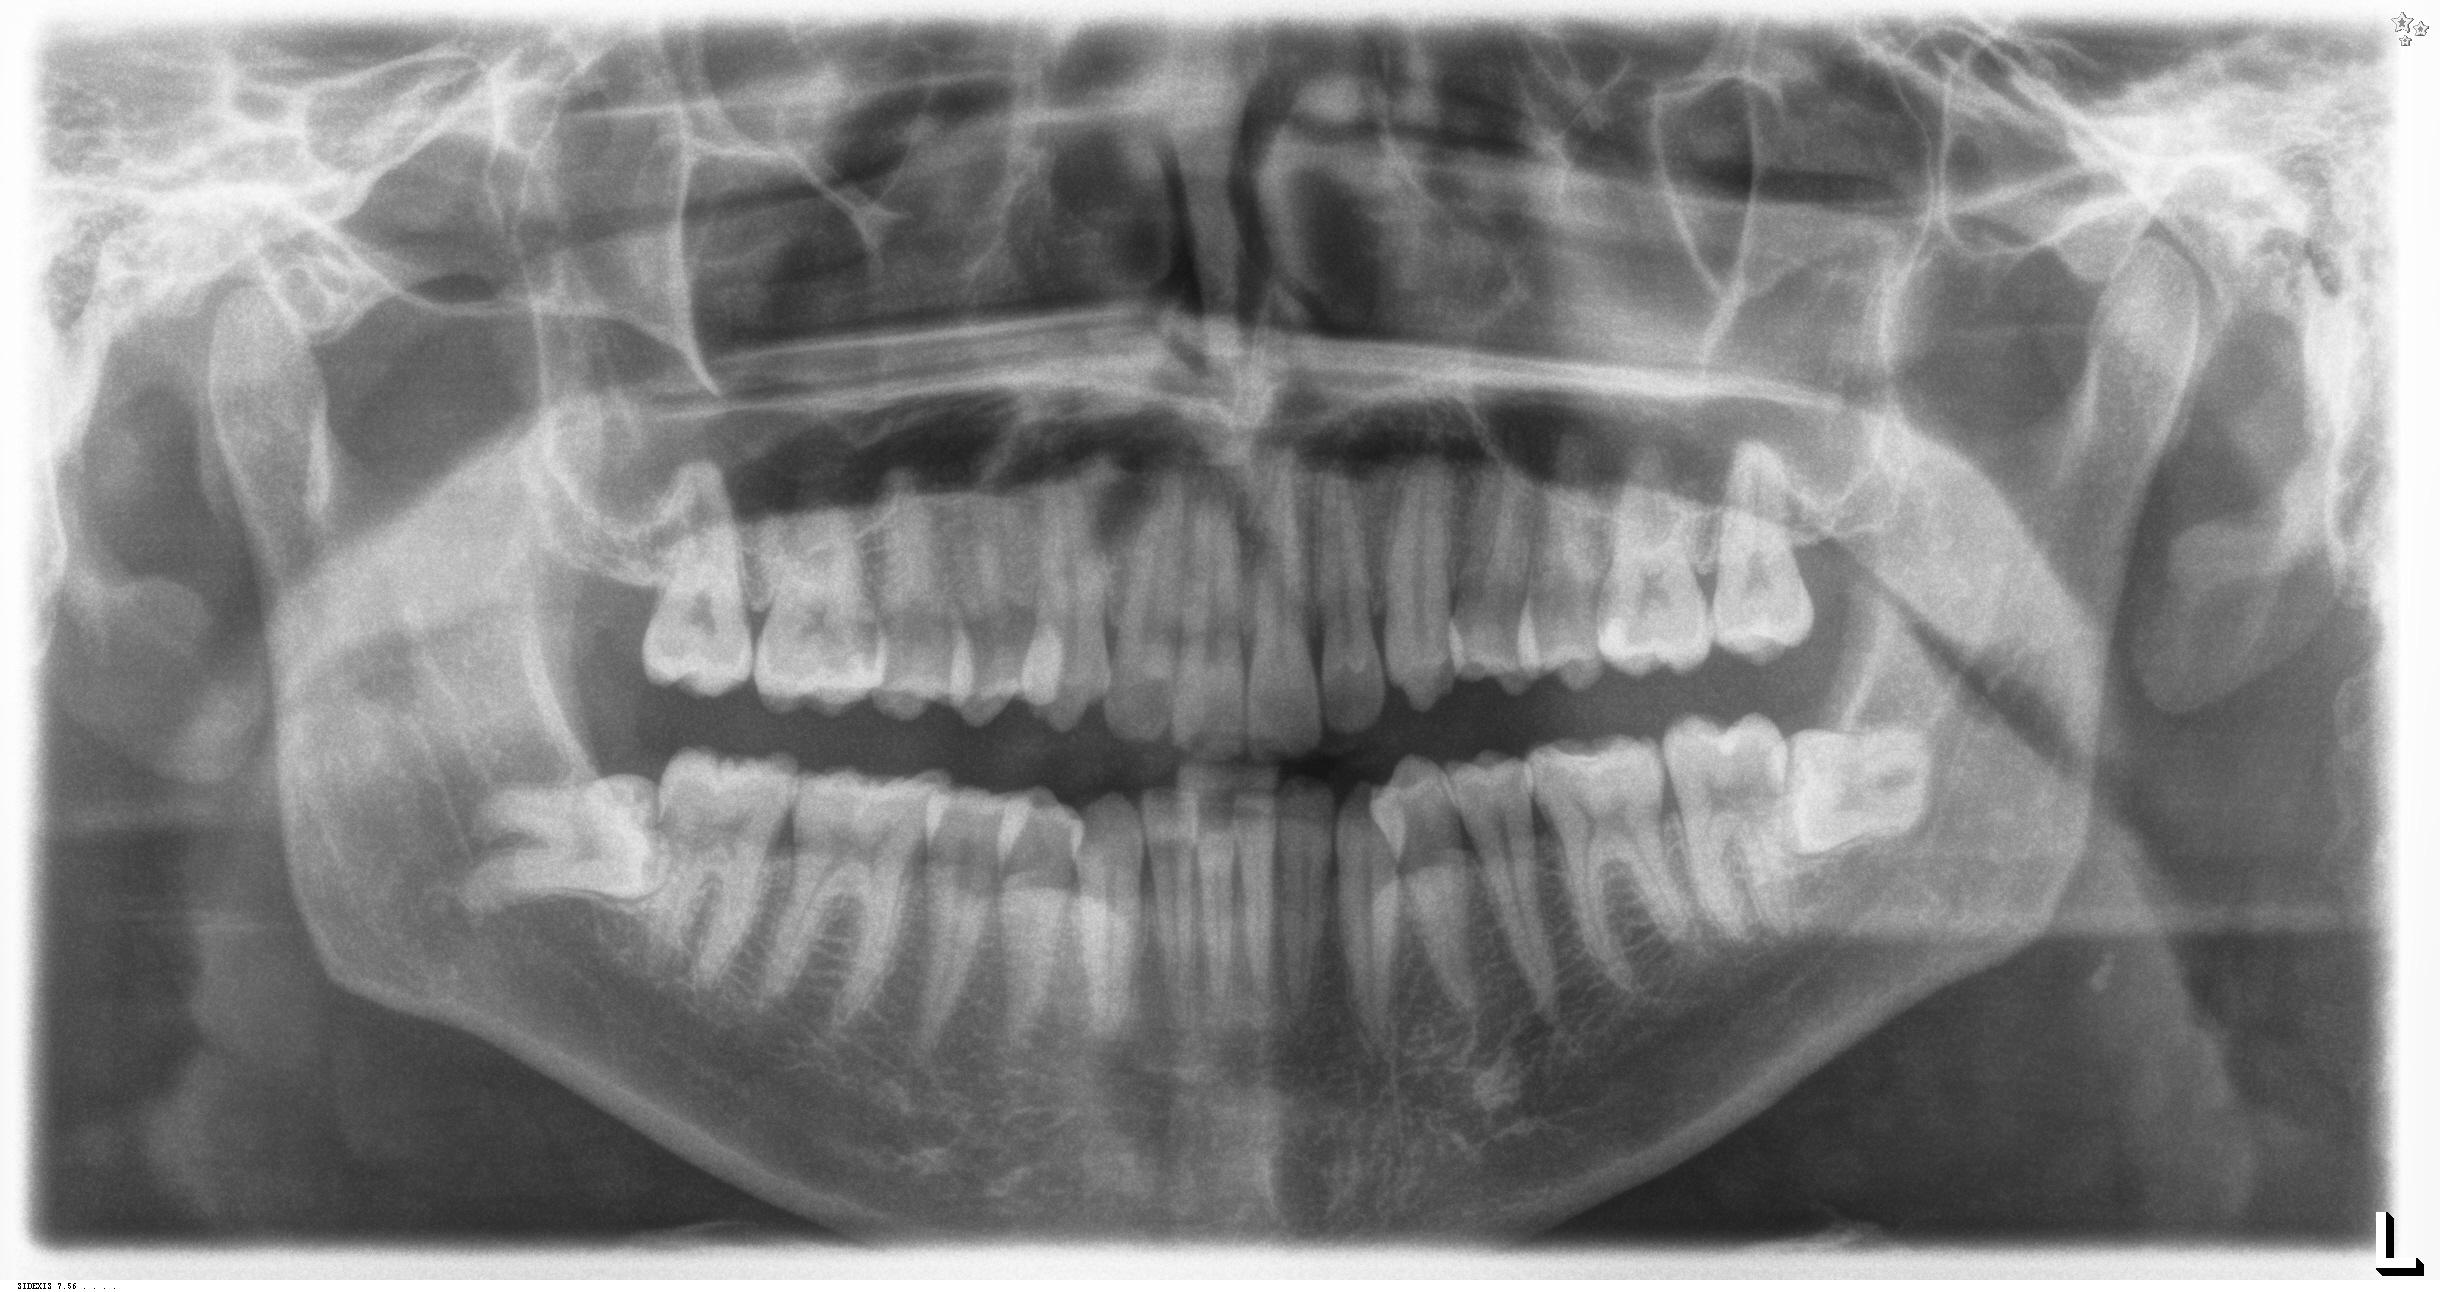 X-ray of Impact Wisdom Teeth